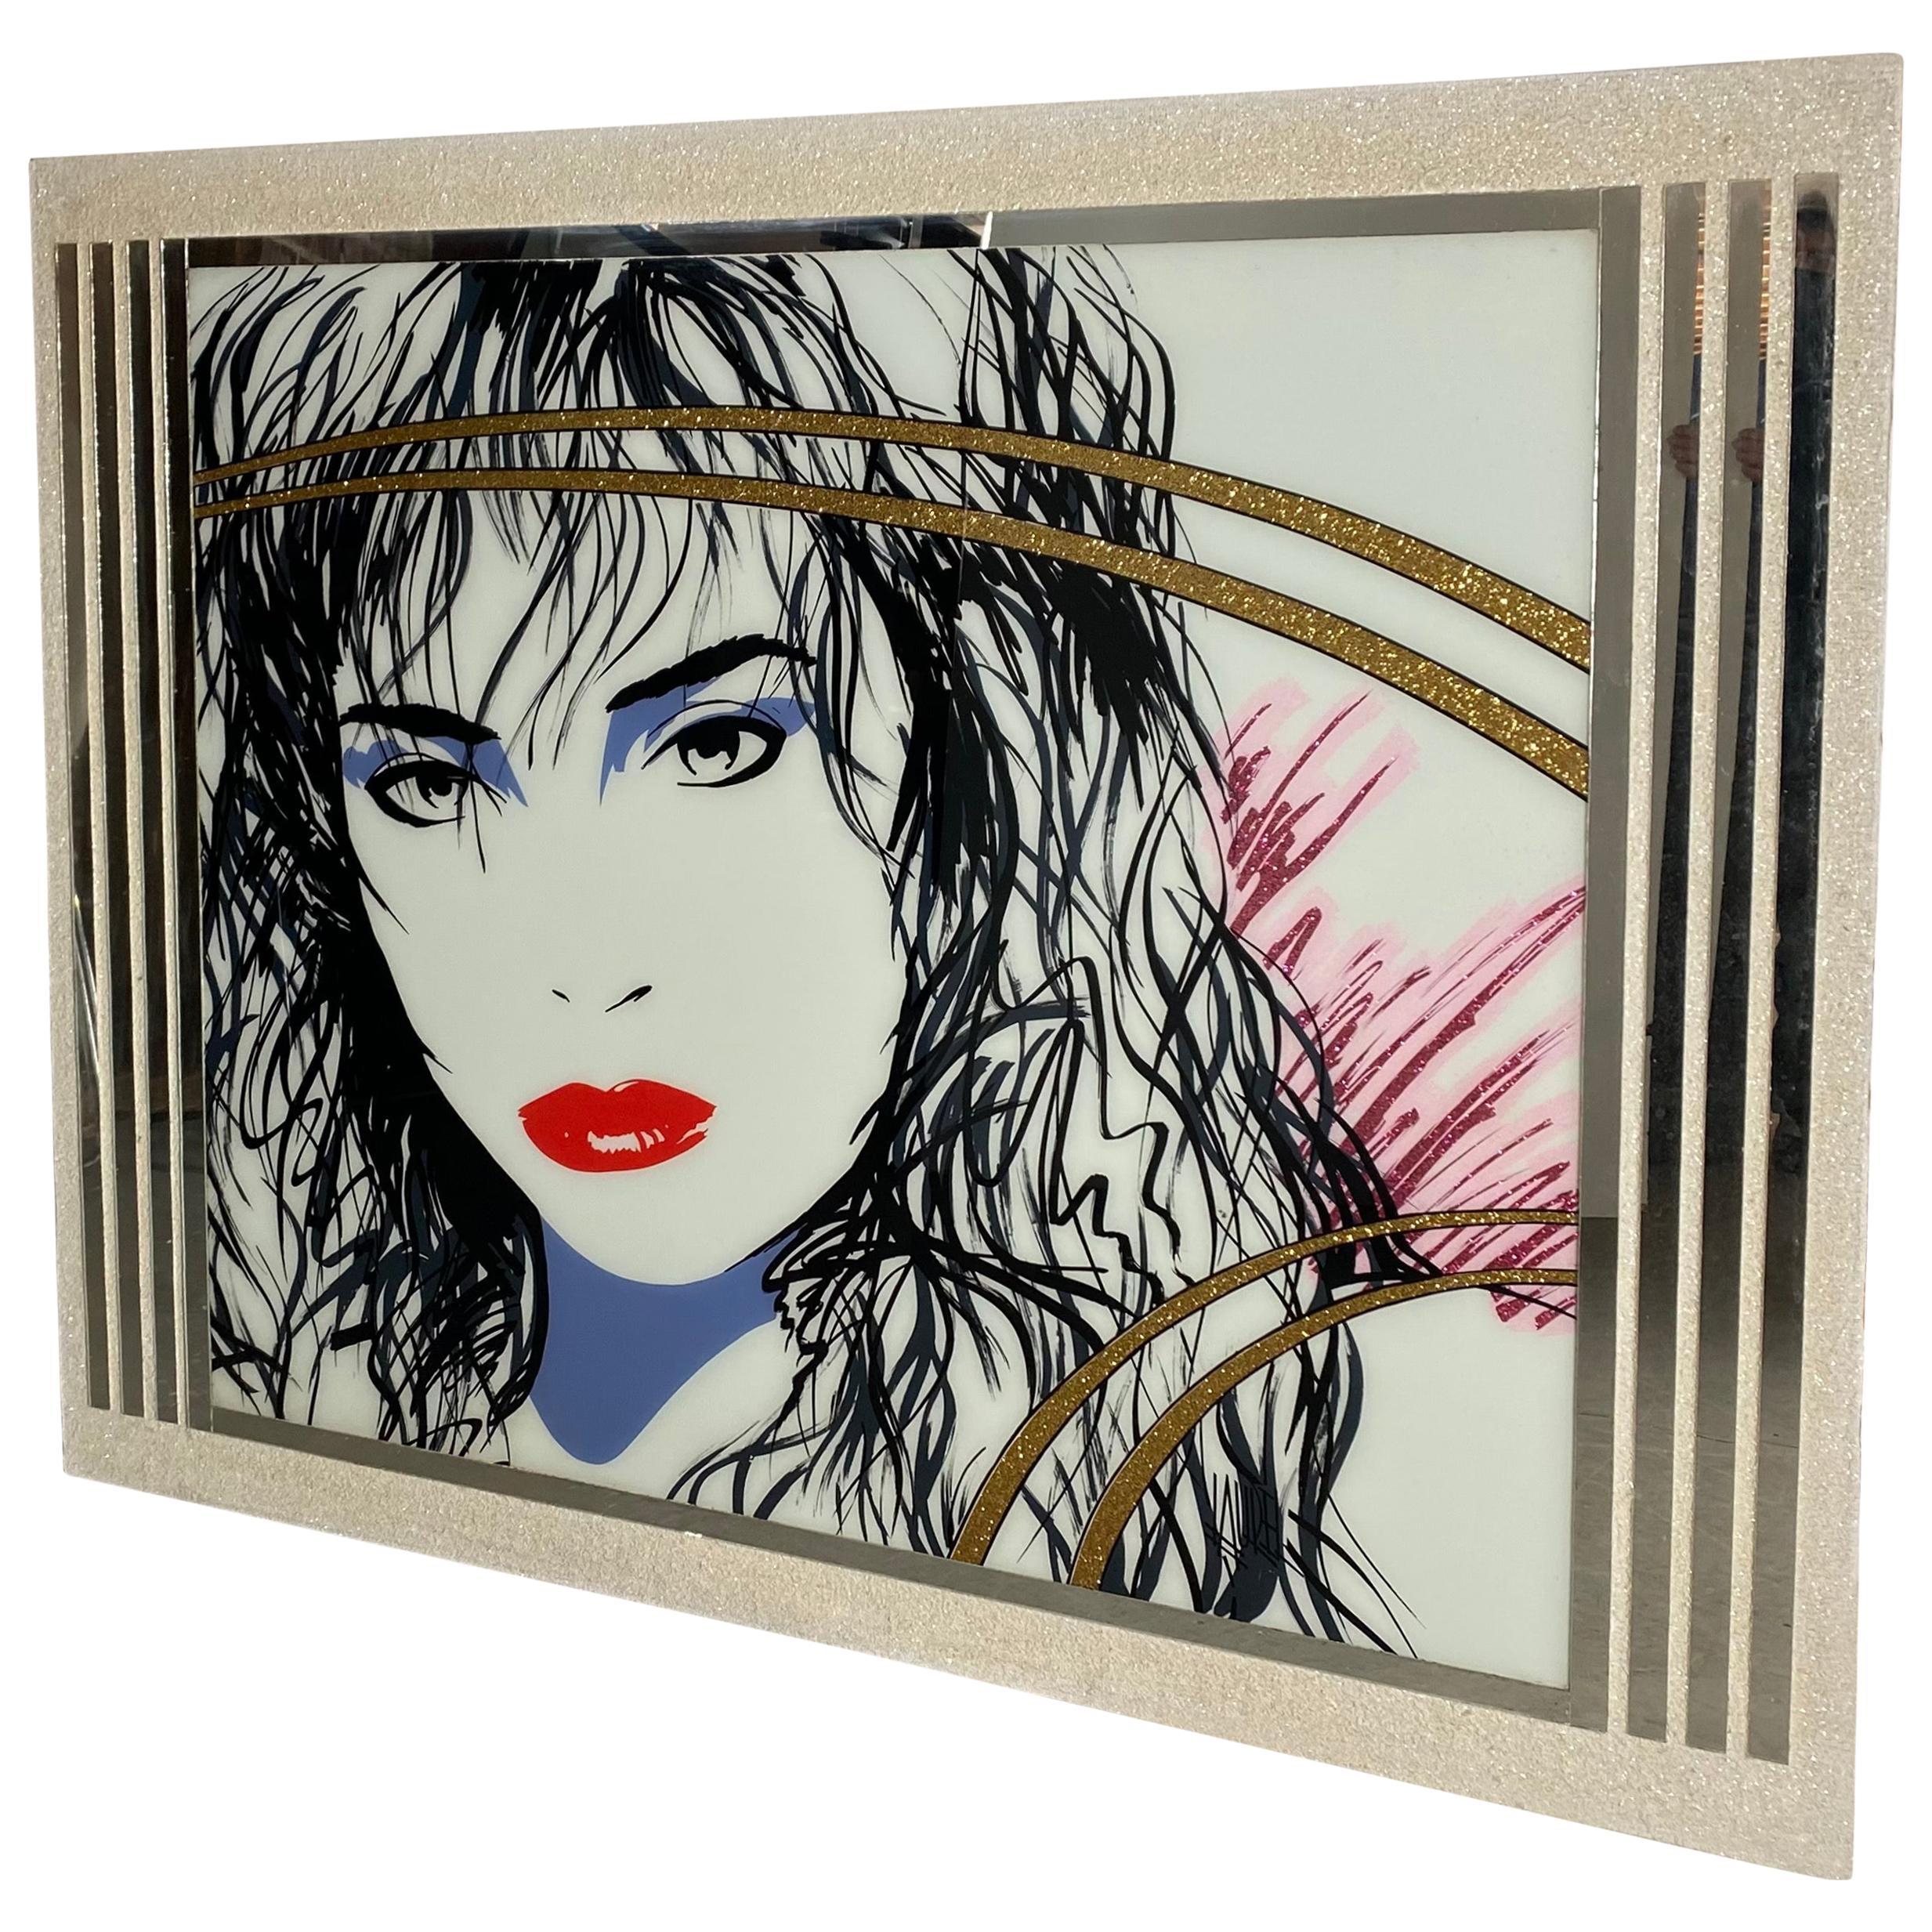 Large 1980s Pop Art, Reverse Painted Mirror, Signed Laurel, after Patrick Nagel